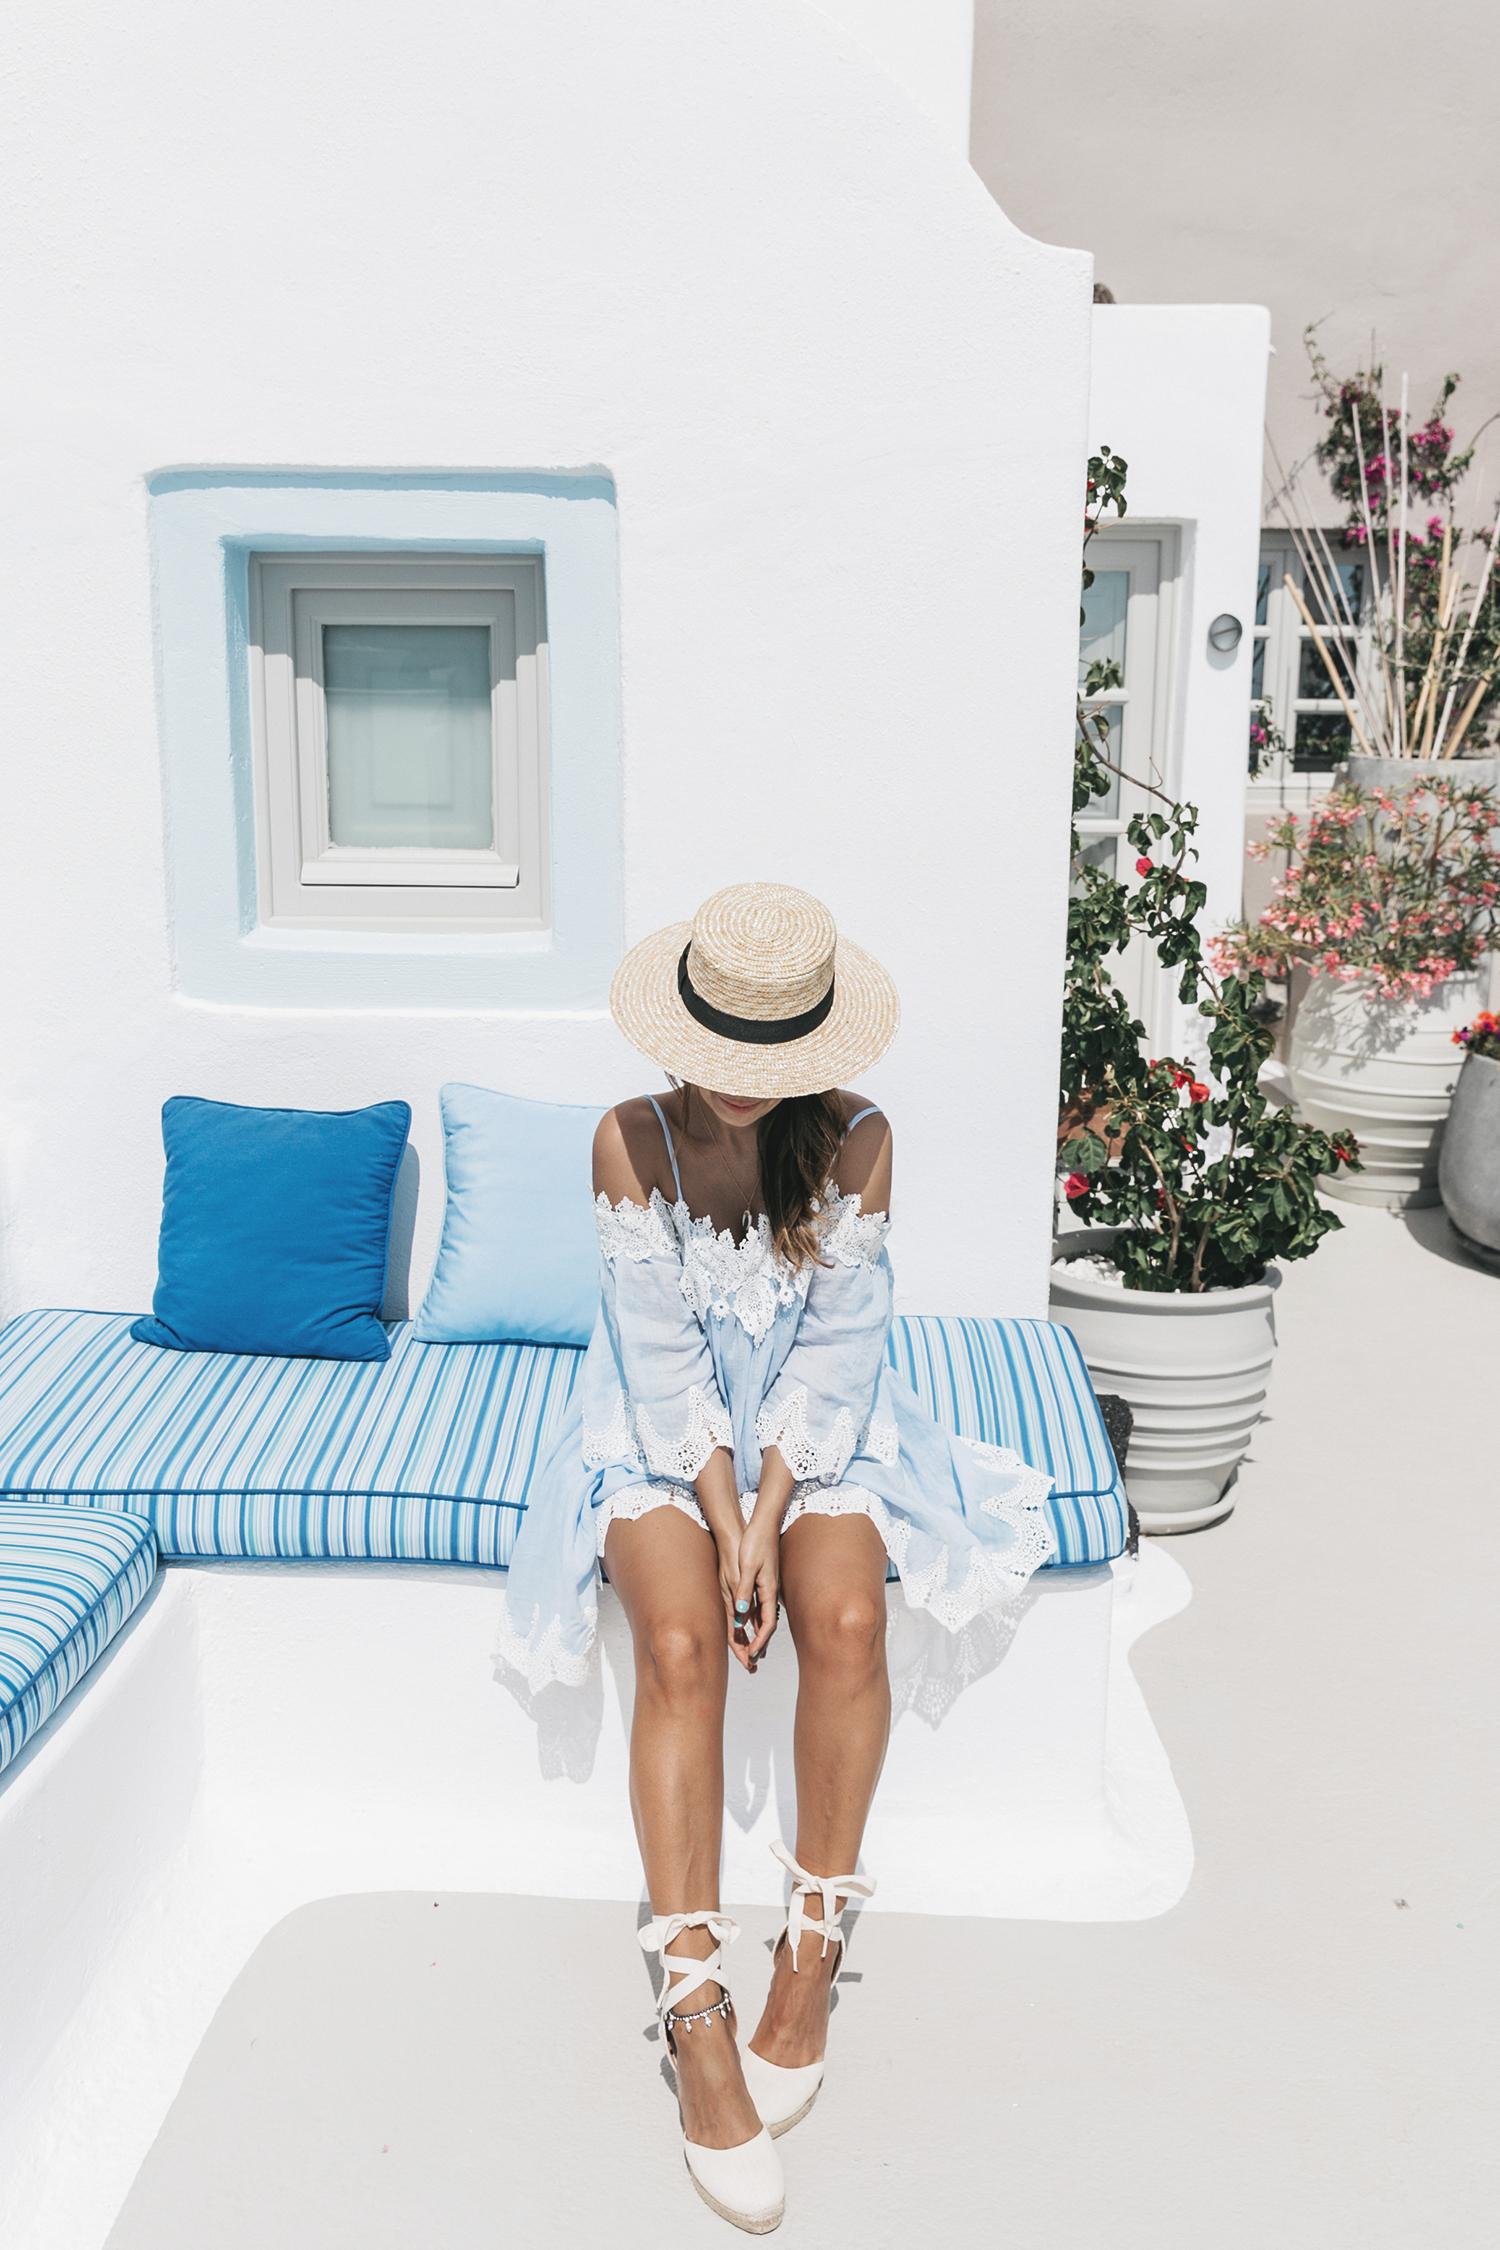 Blue_Dress-Soludos_Escapes-Soludos_Espadrilles-Canotier-Hat-Lack_Of_Color-Summer-Santorini-Collage_Vintage-83